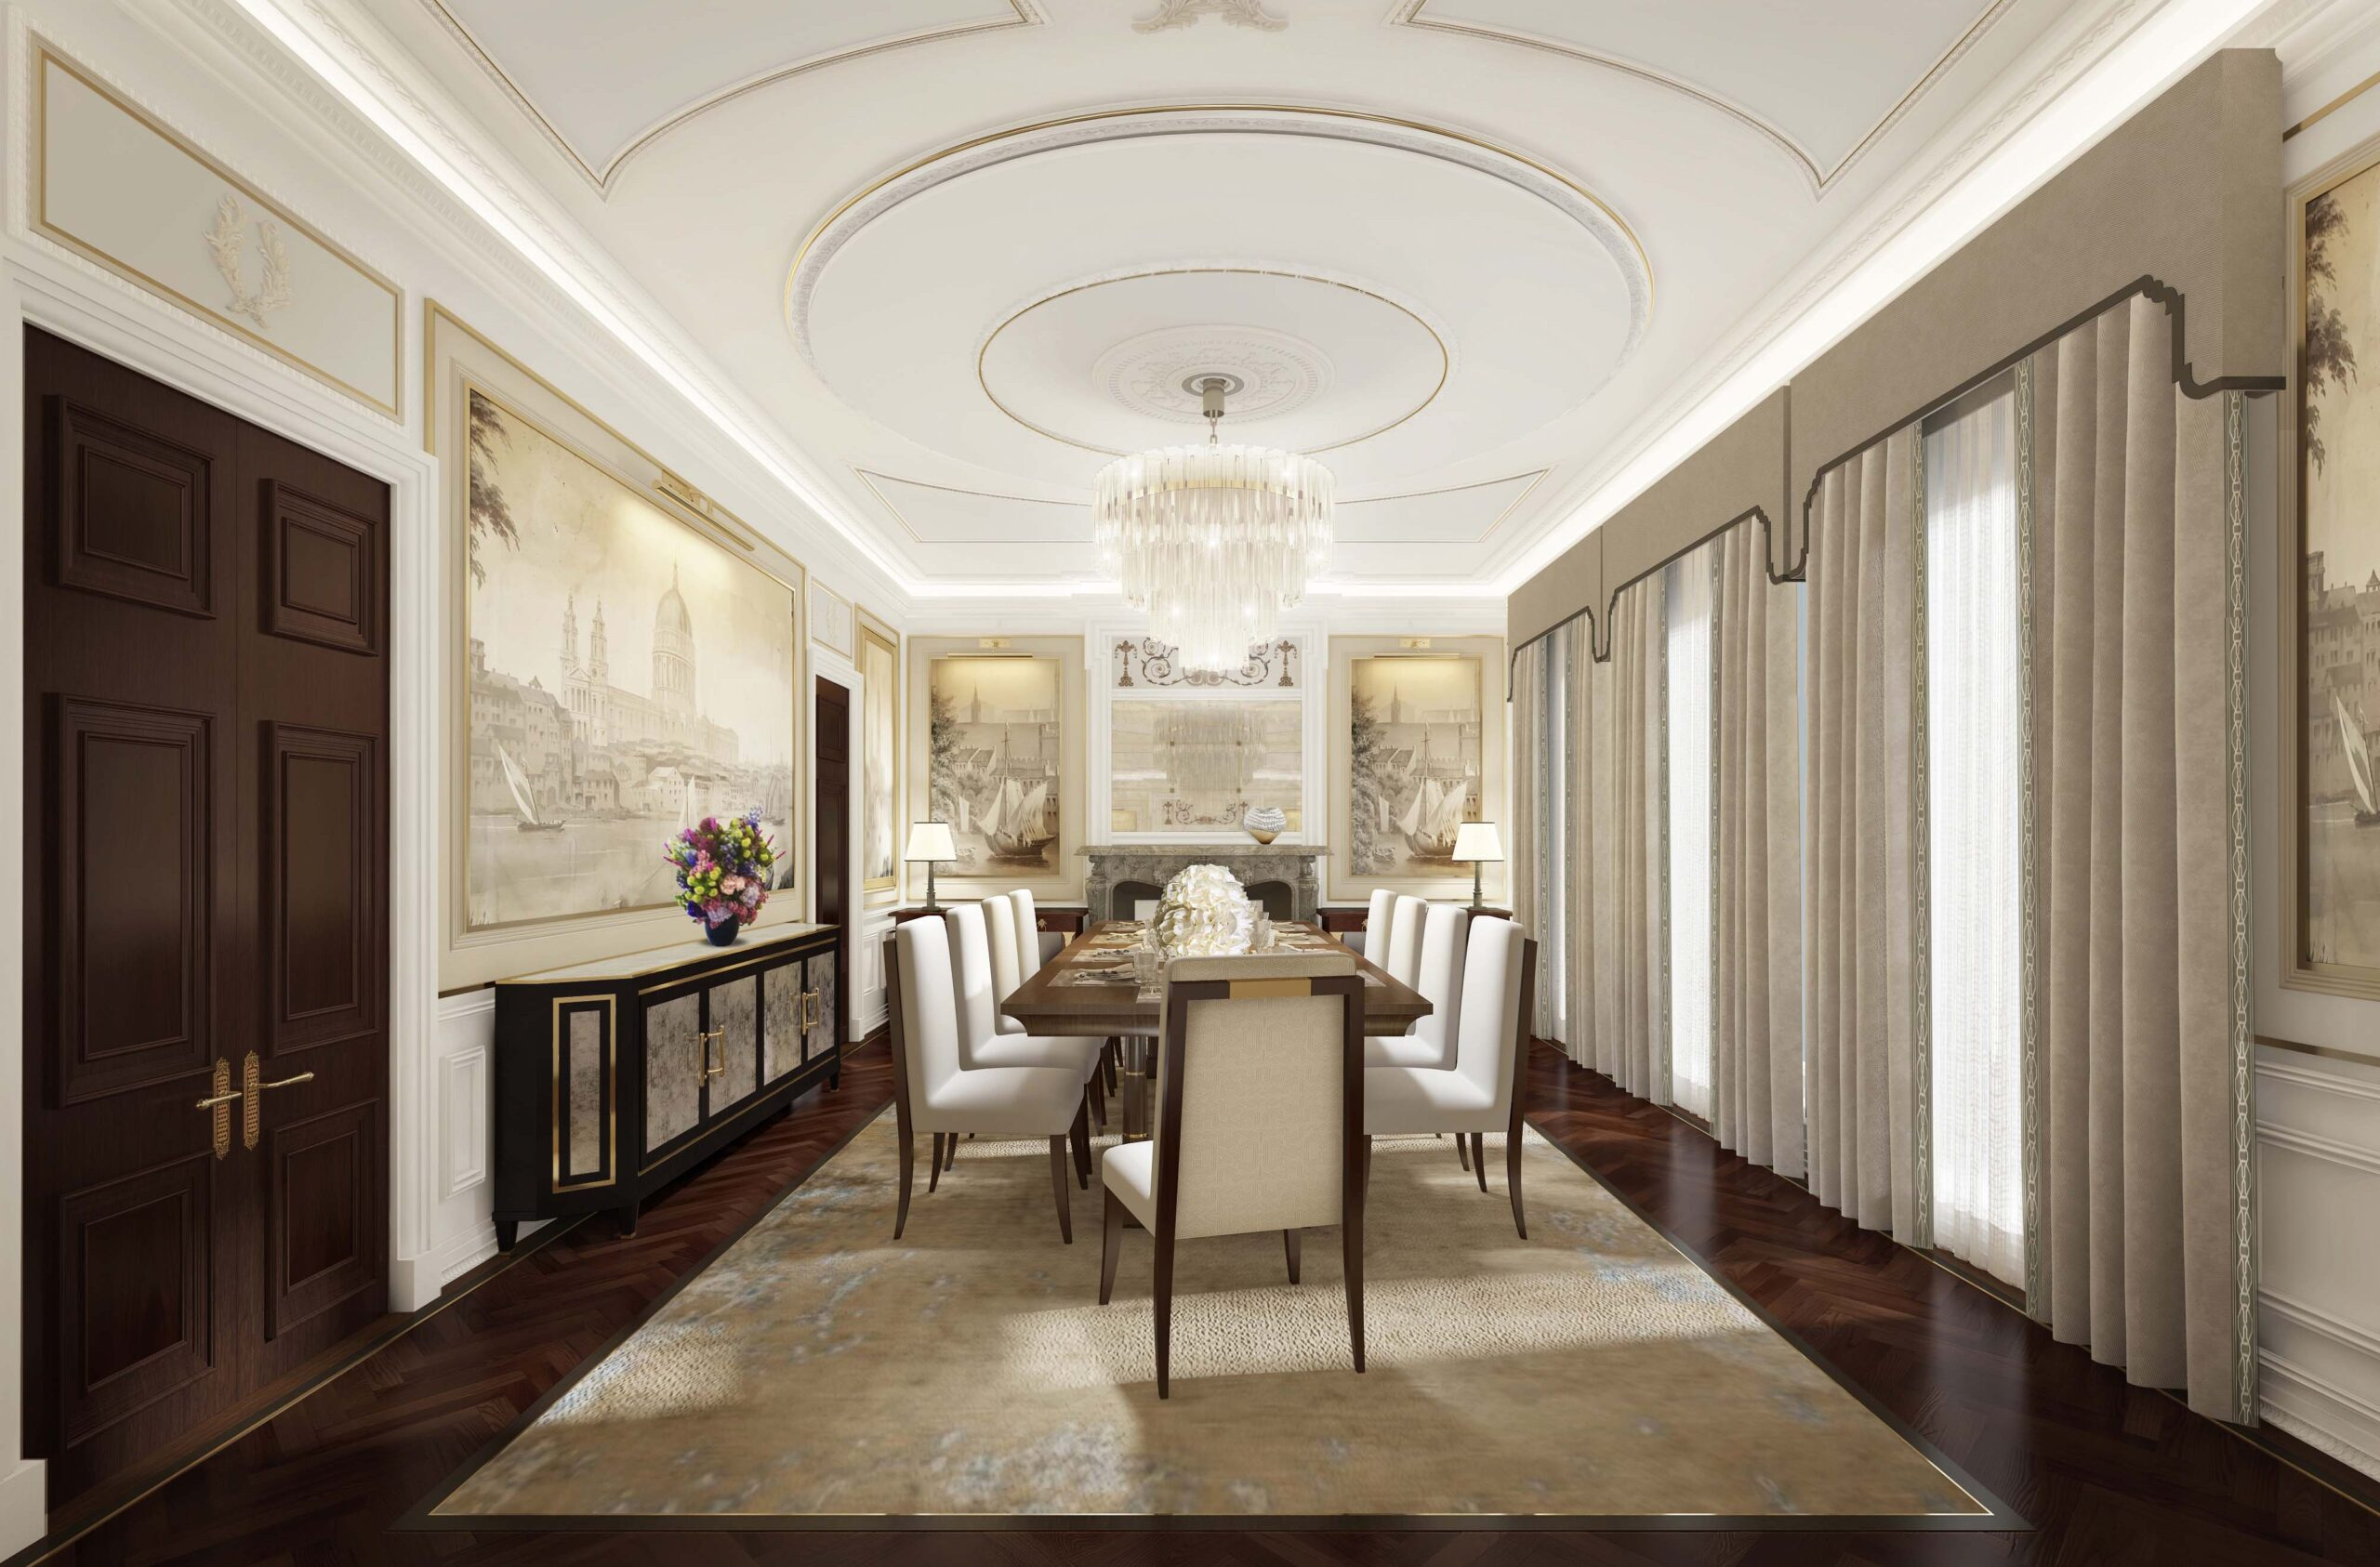 Luxury historic property rennovation